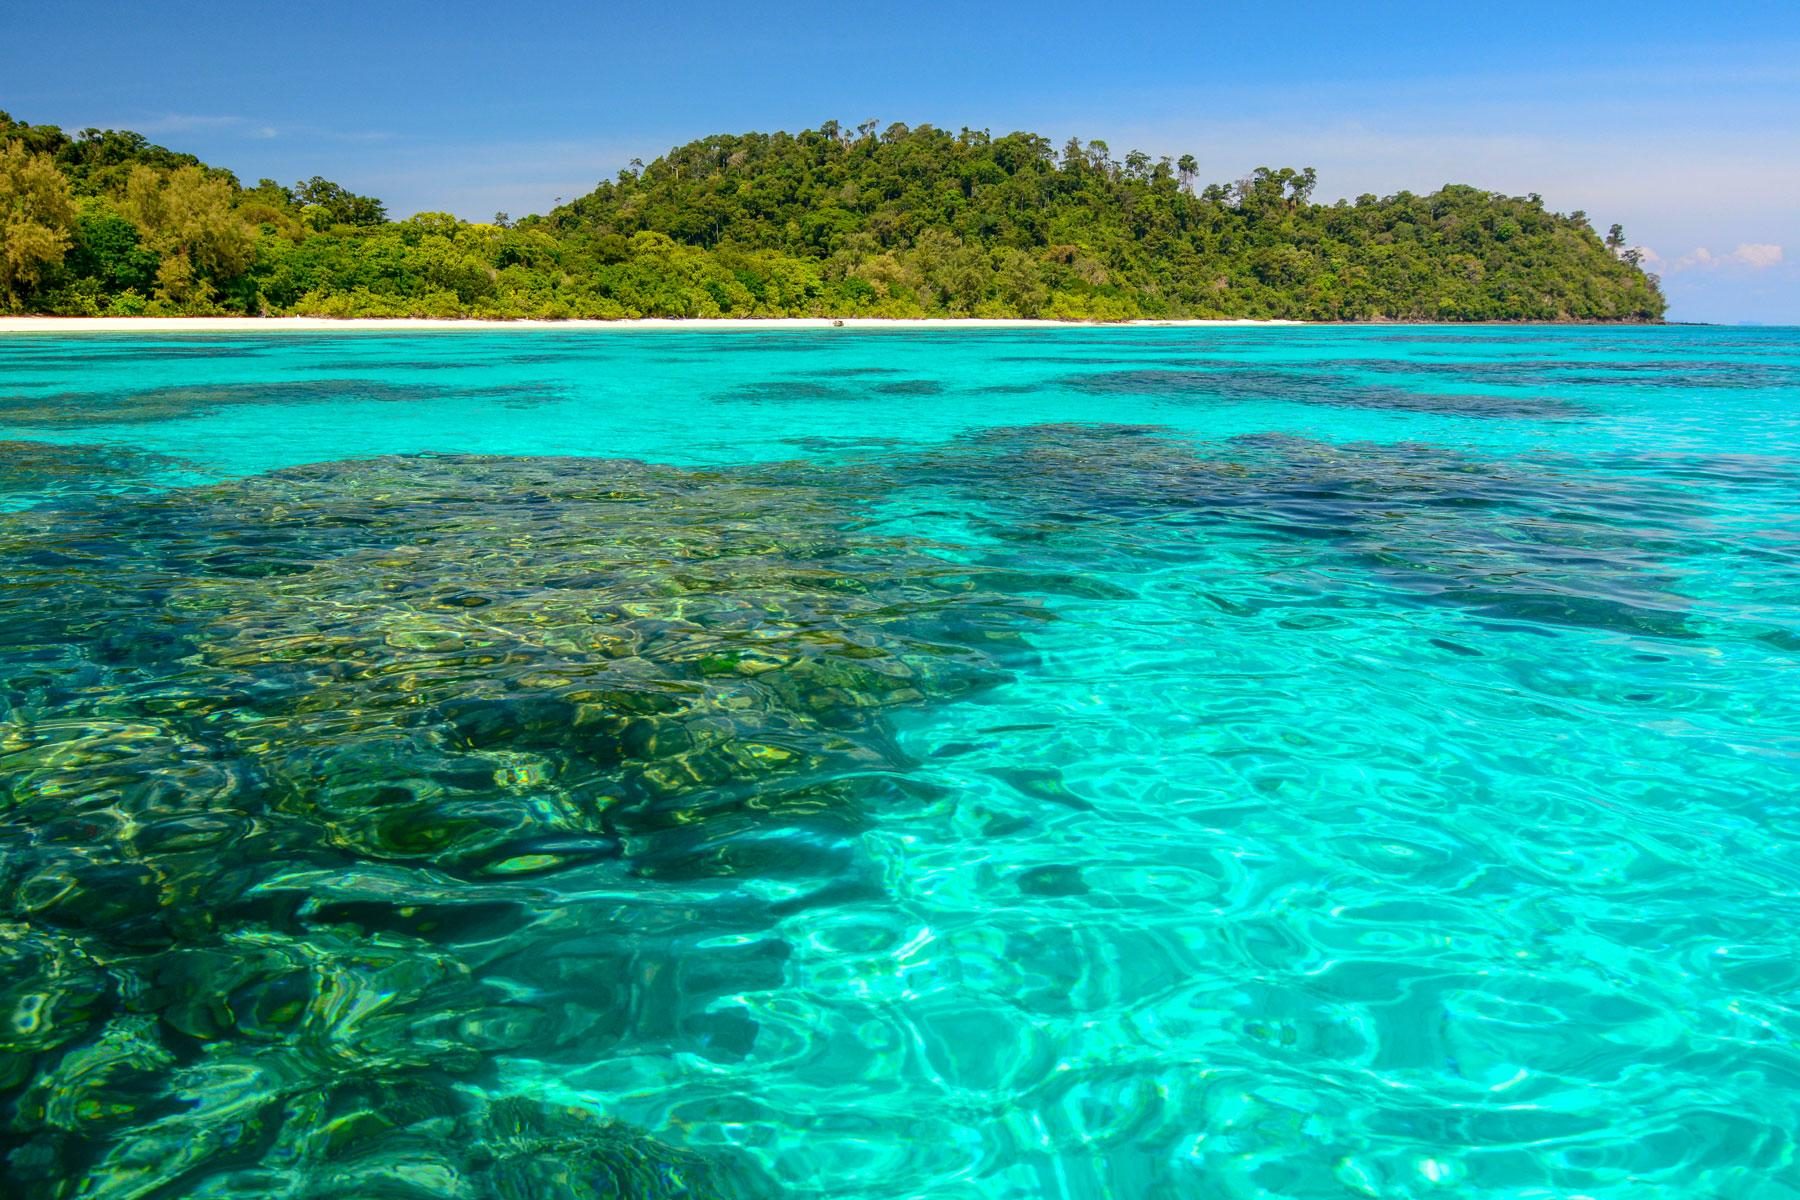 06_Thailand_Snorkeling_Diving_Koh_Rok_dreamstime_xxl_87111159